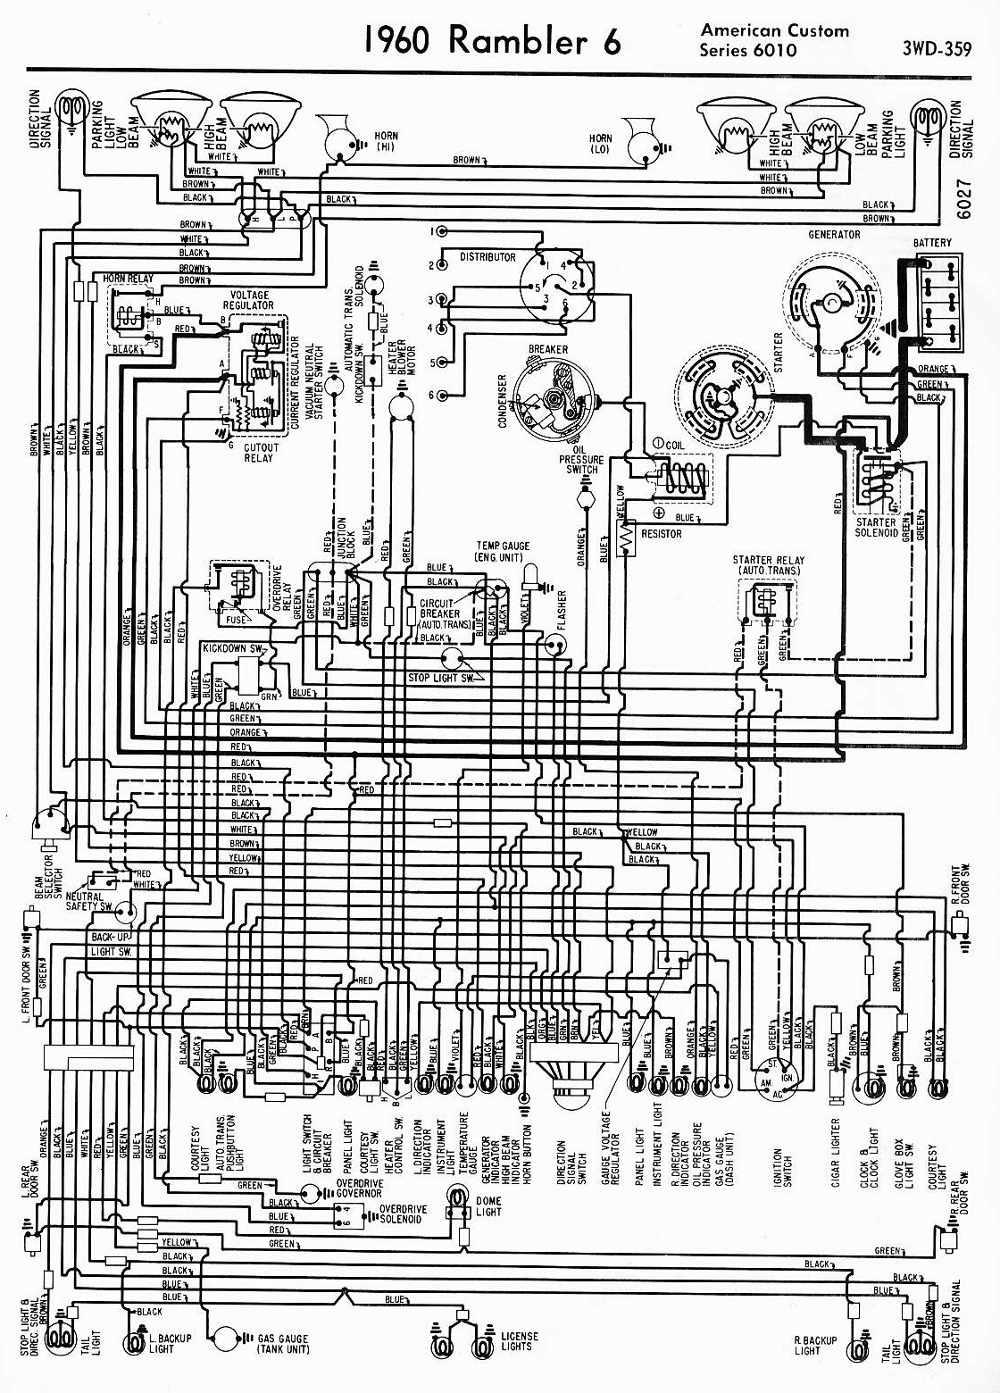 Amc Hornet Wiring Diagram Amc Car Manual Pdf Amp Diagnostic Trouble Codes